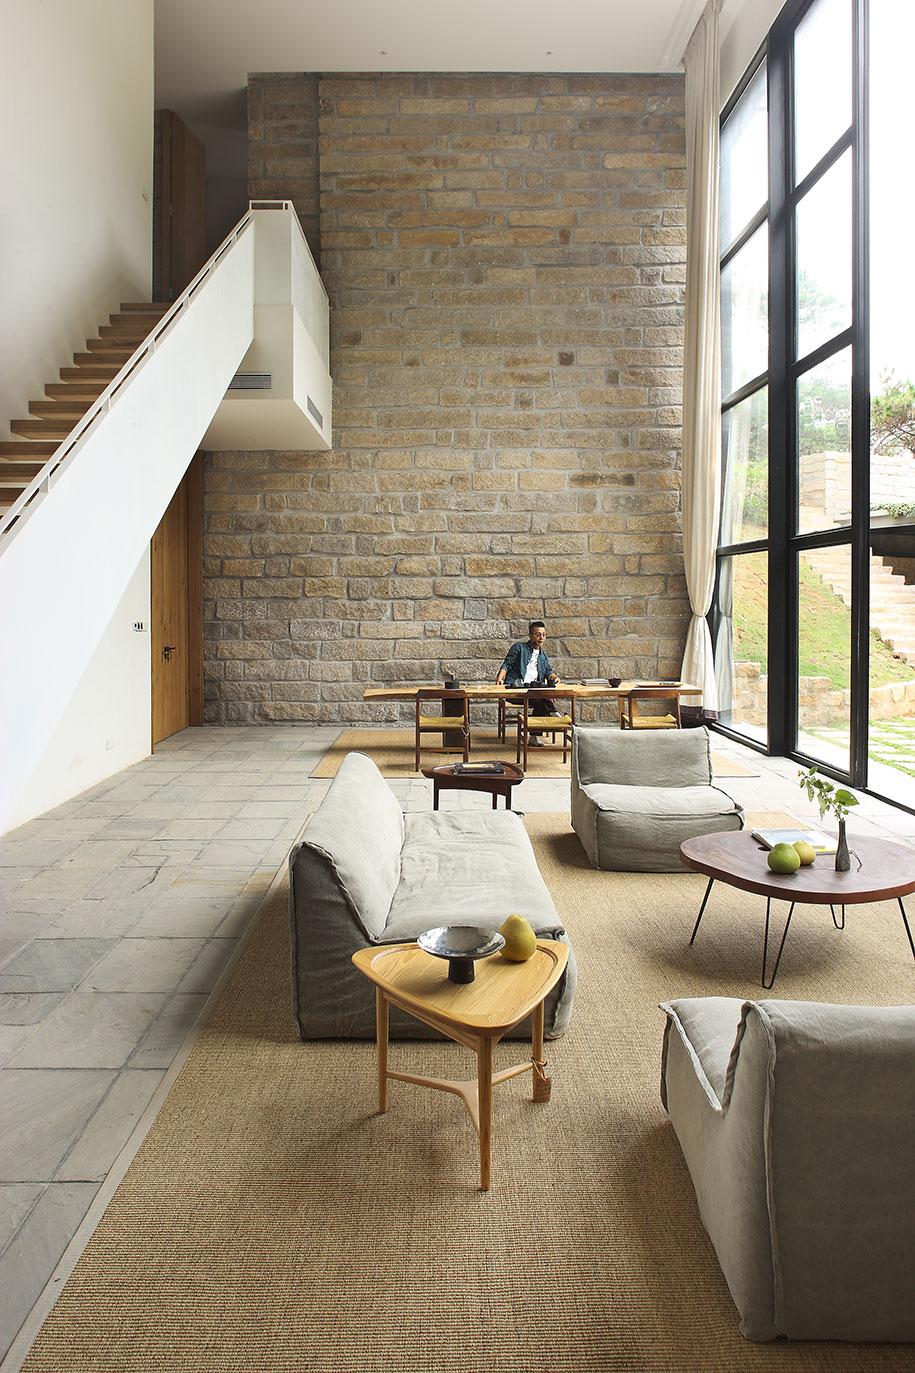 Returning Hut FMX.X Interior Design ground floor